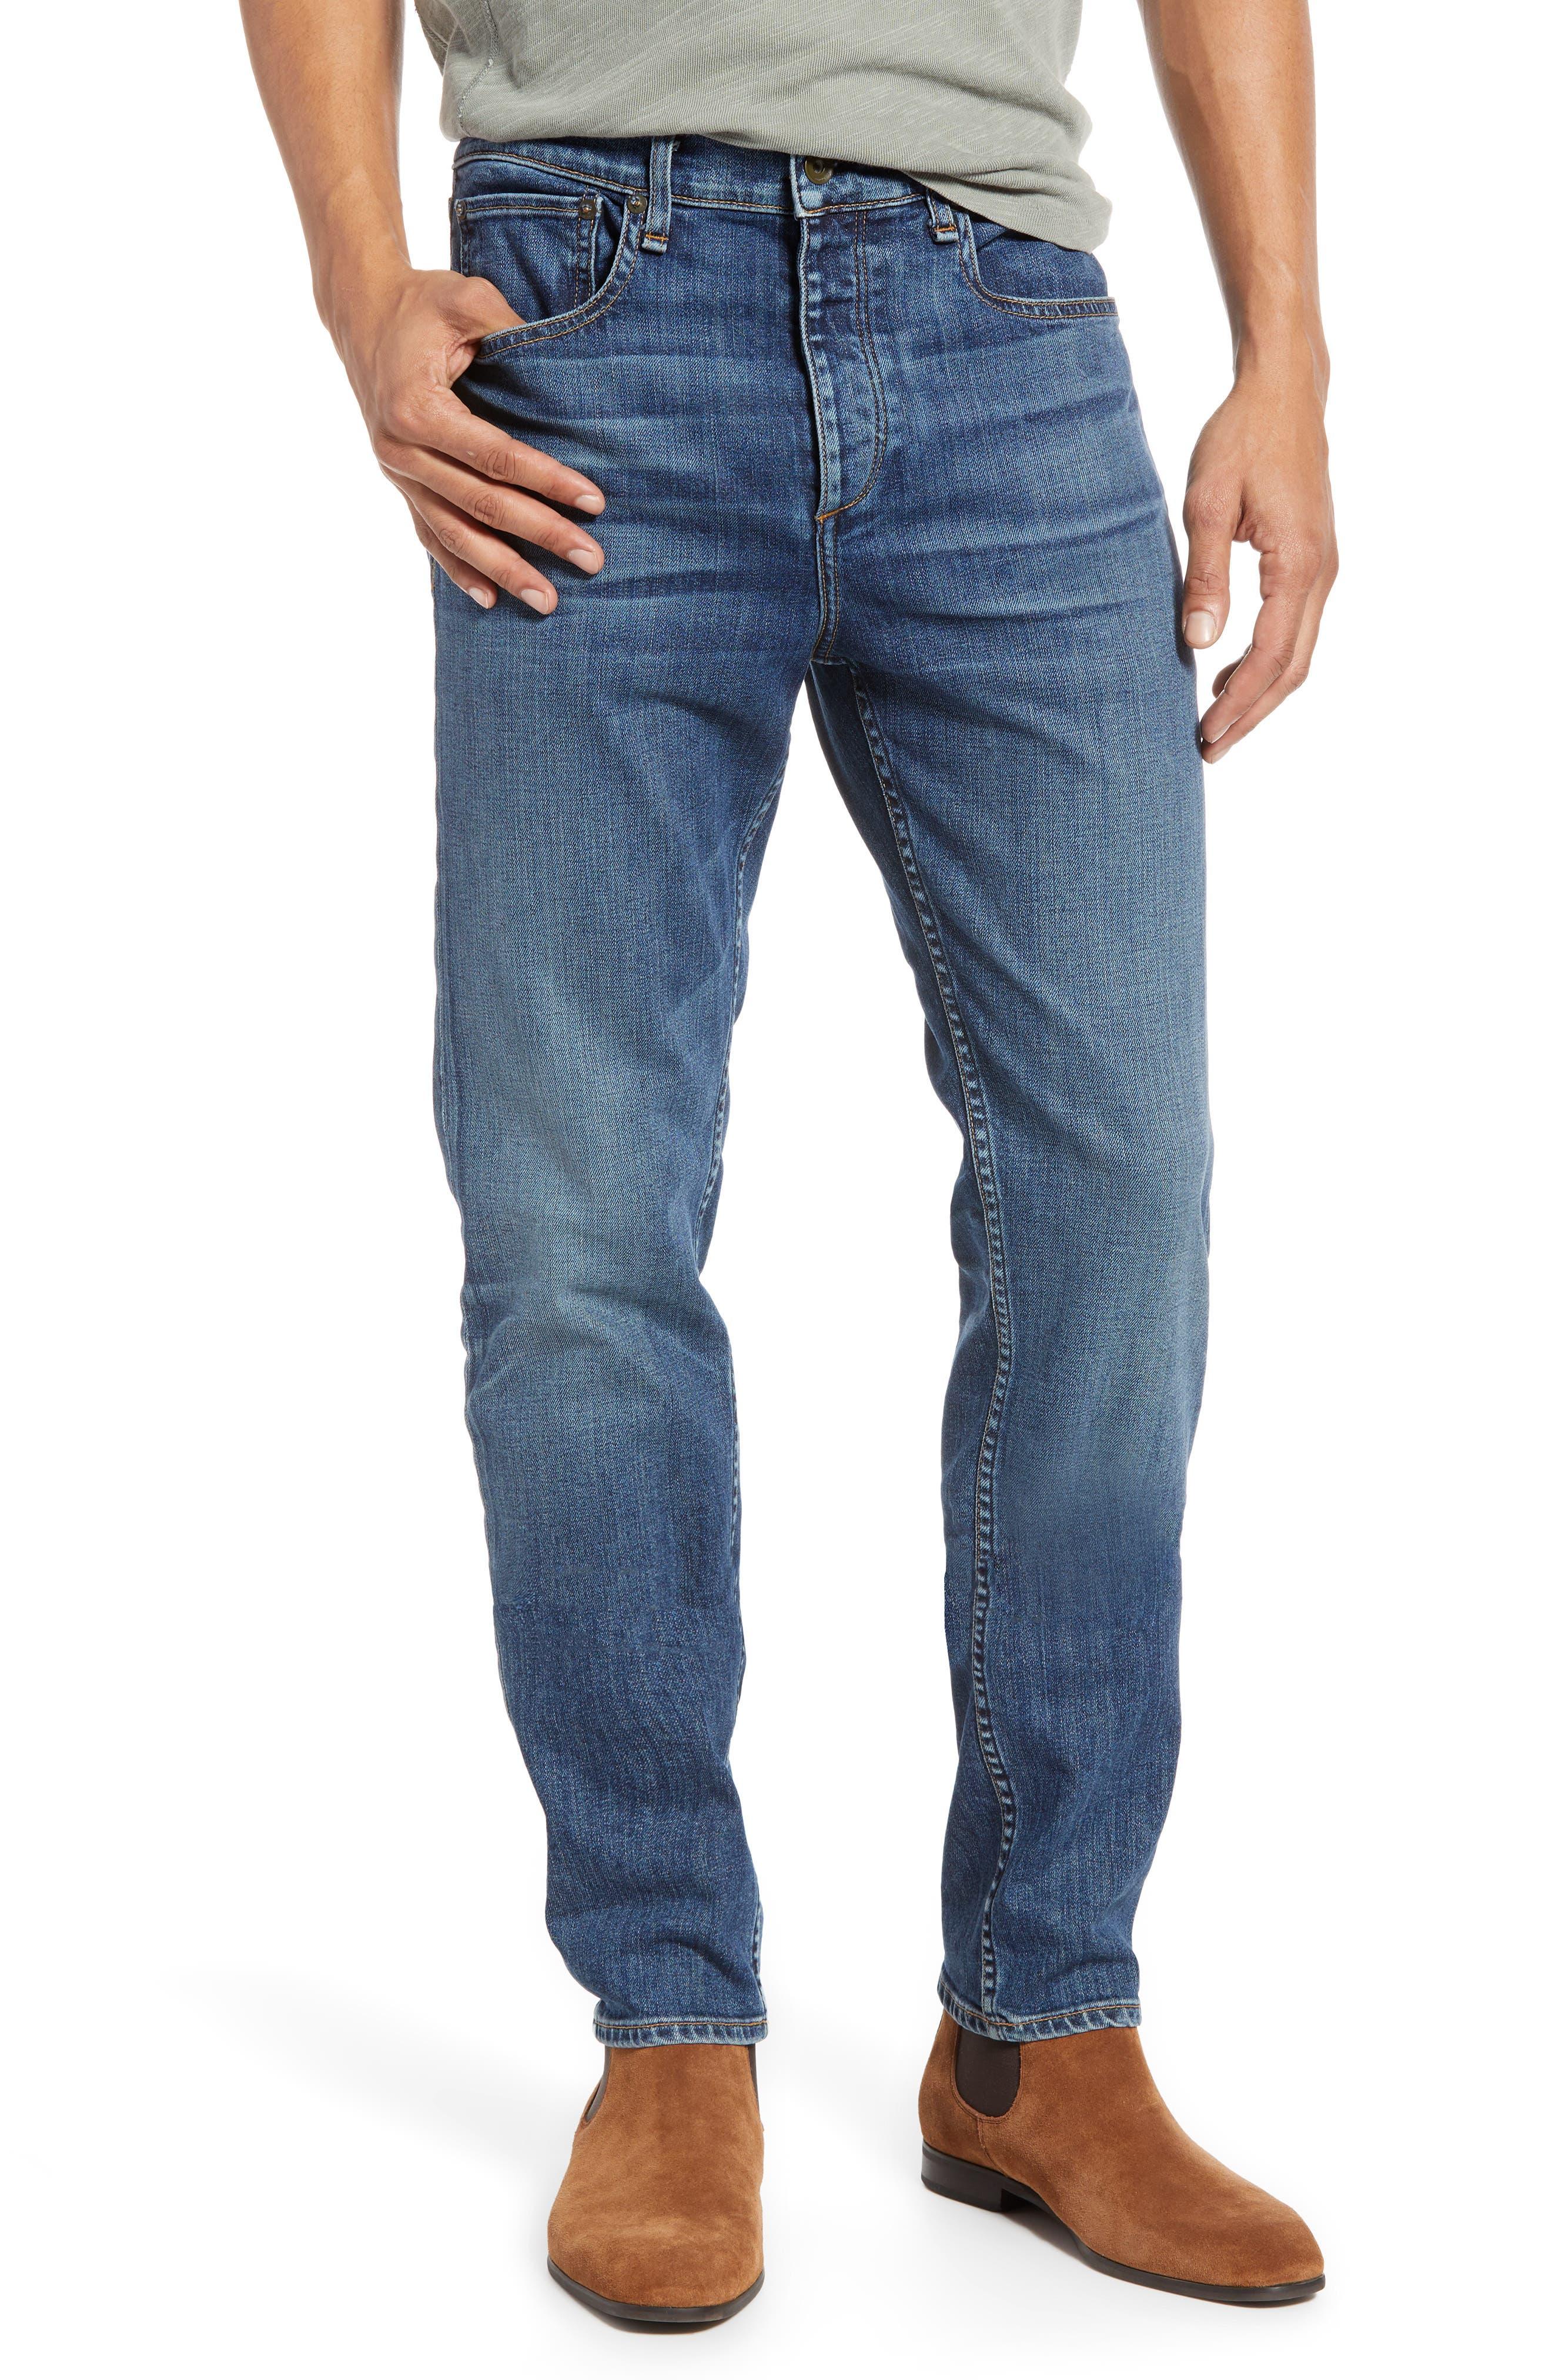 RAG & BONE, Fit 2 Slim Fit Jeans, Main thumbnail 1, color, THROOP